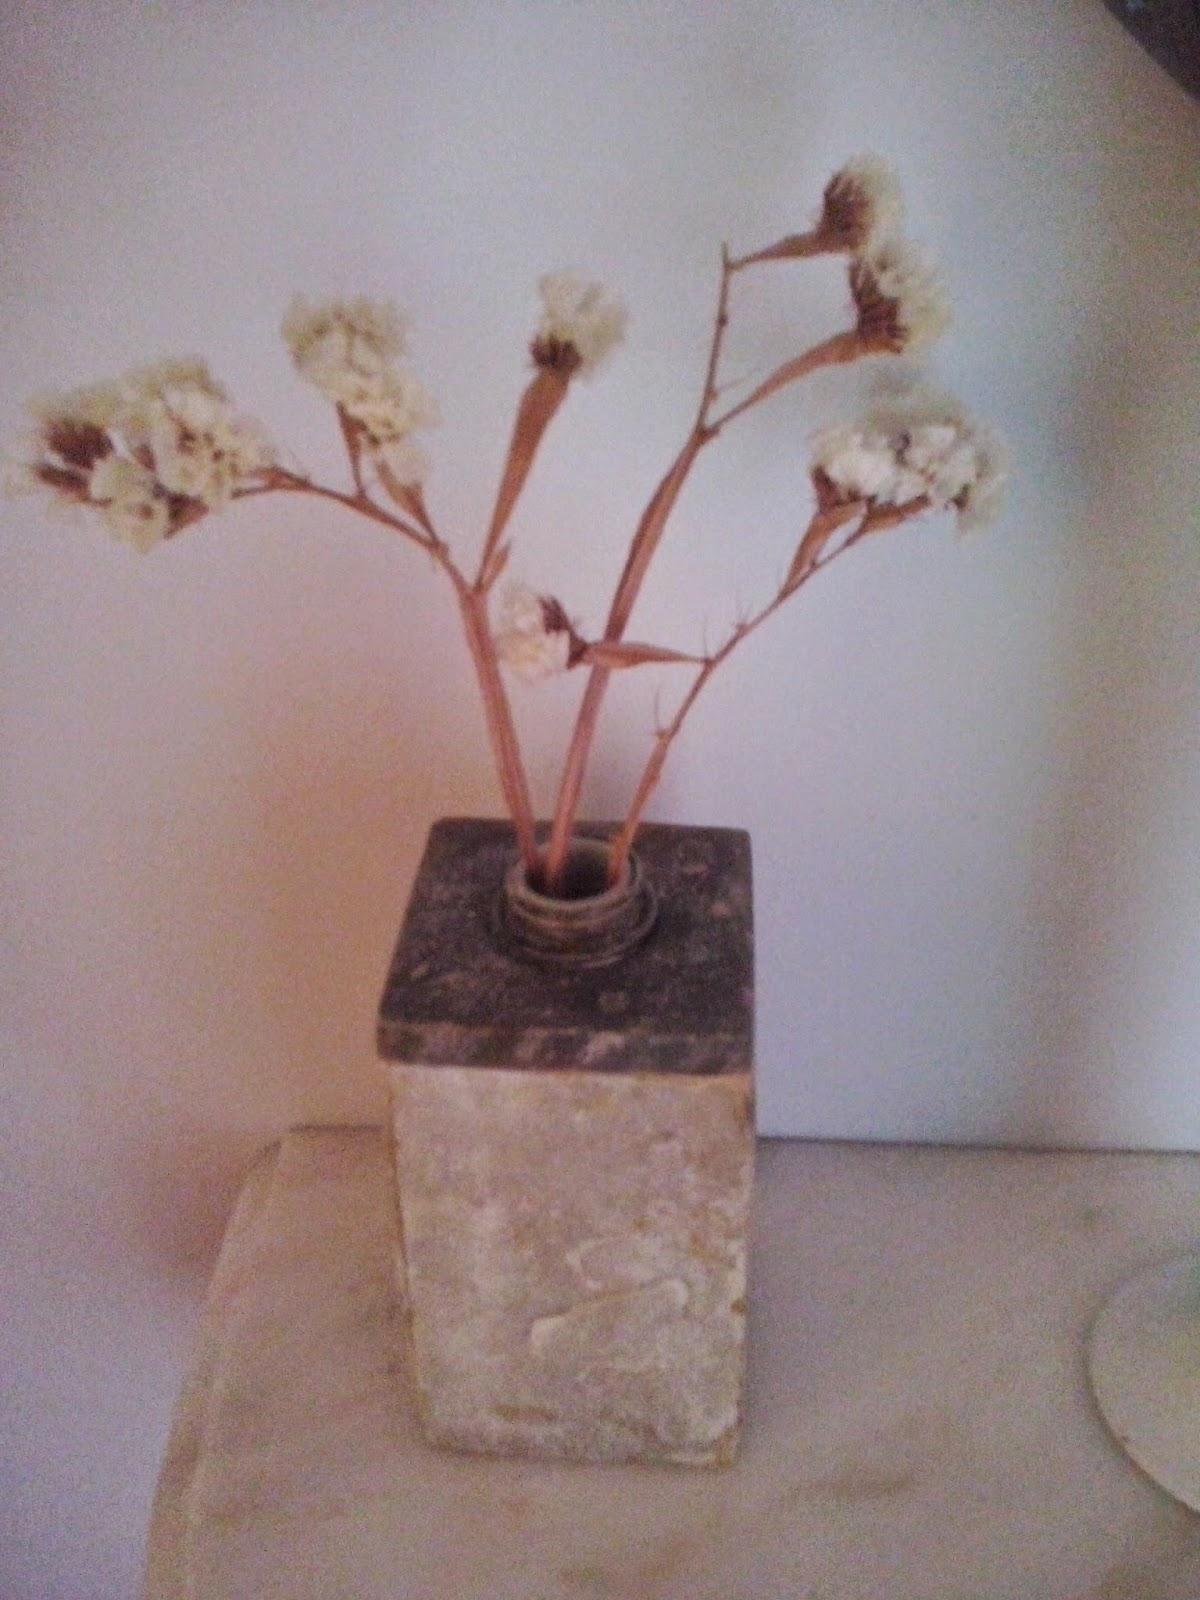 Decoraconmar a detalles para el hogar florero for Detalles para el hogar